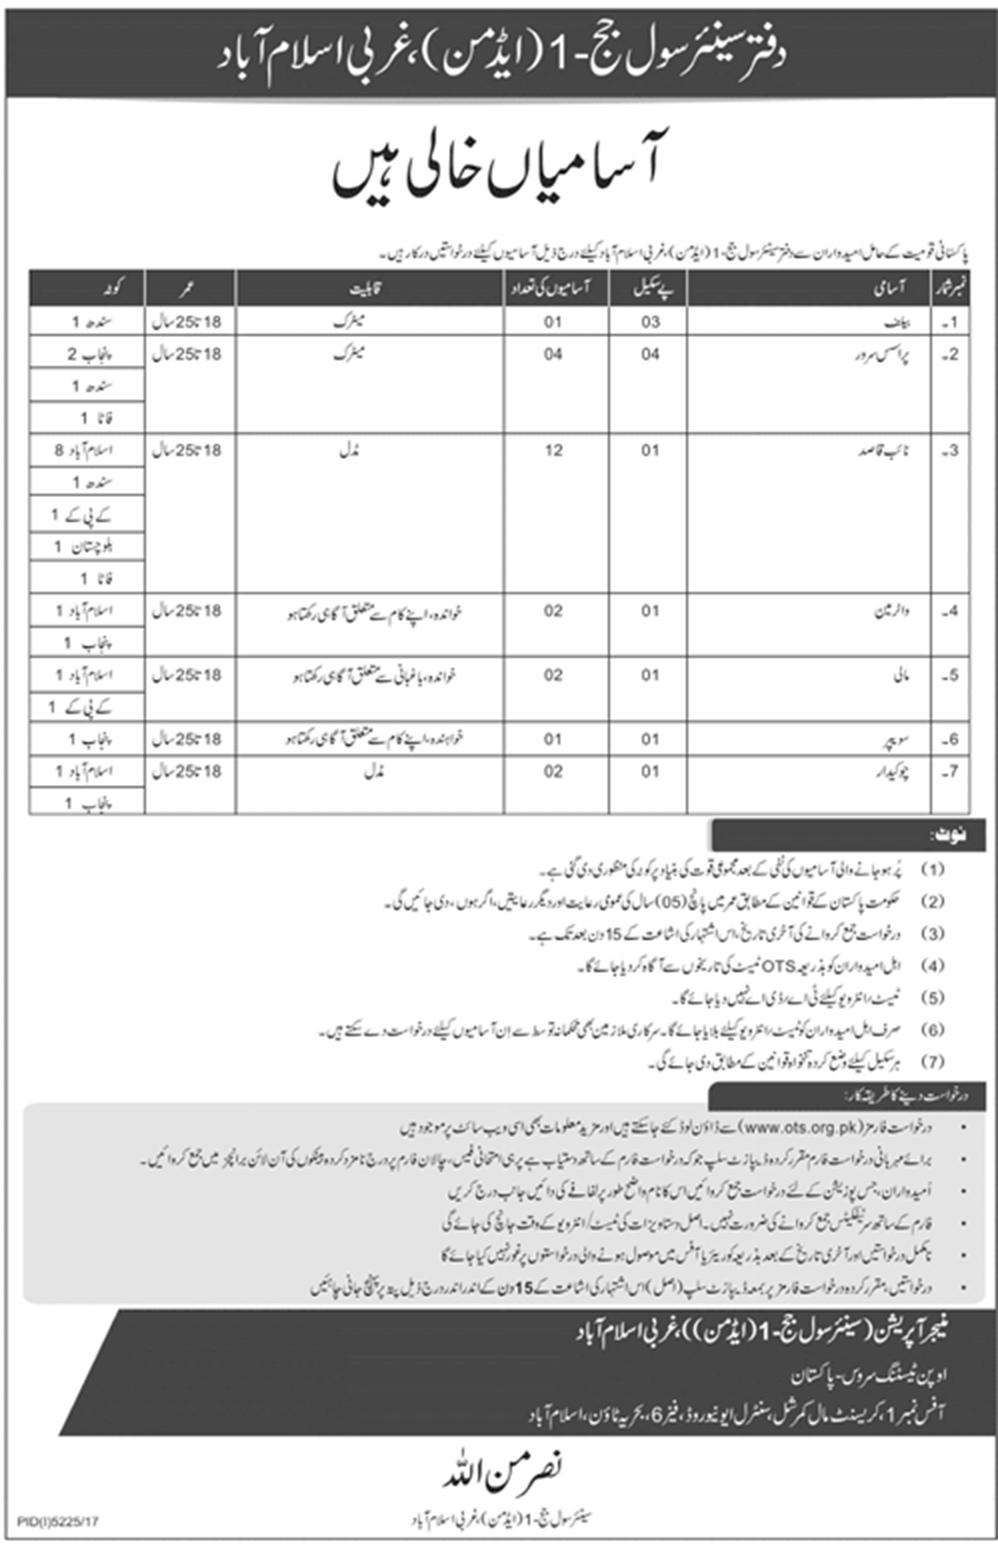 OTS Jobs in Office Senior Civil Judge-I West Islamabad 2018 Online Applicatin Form Download